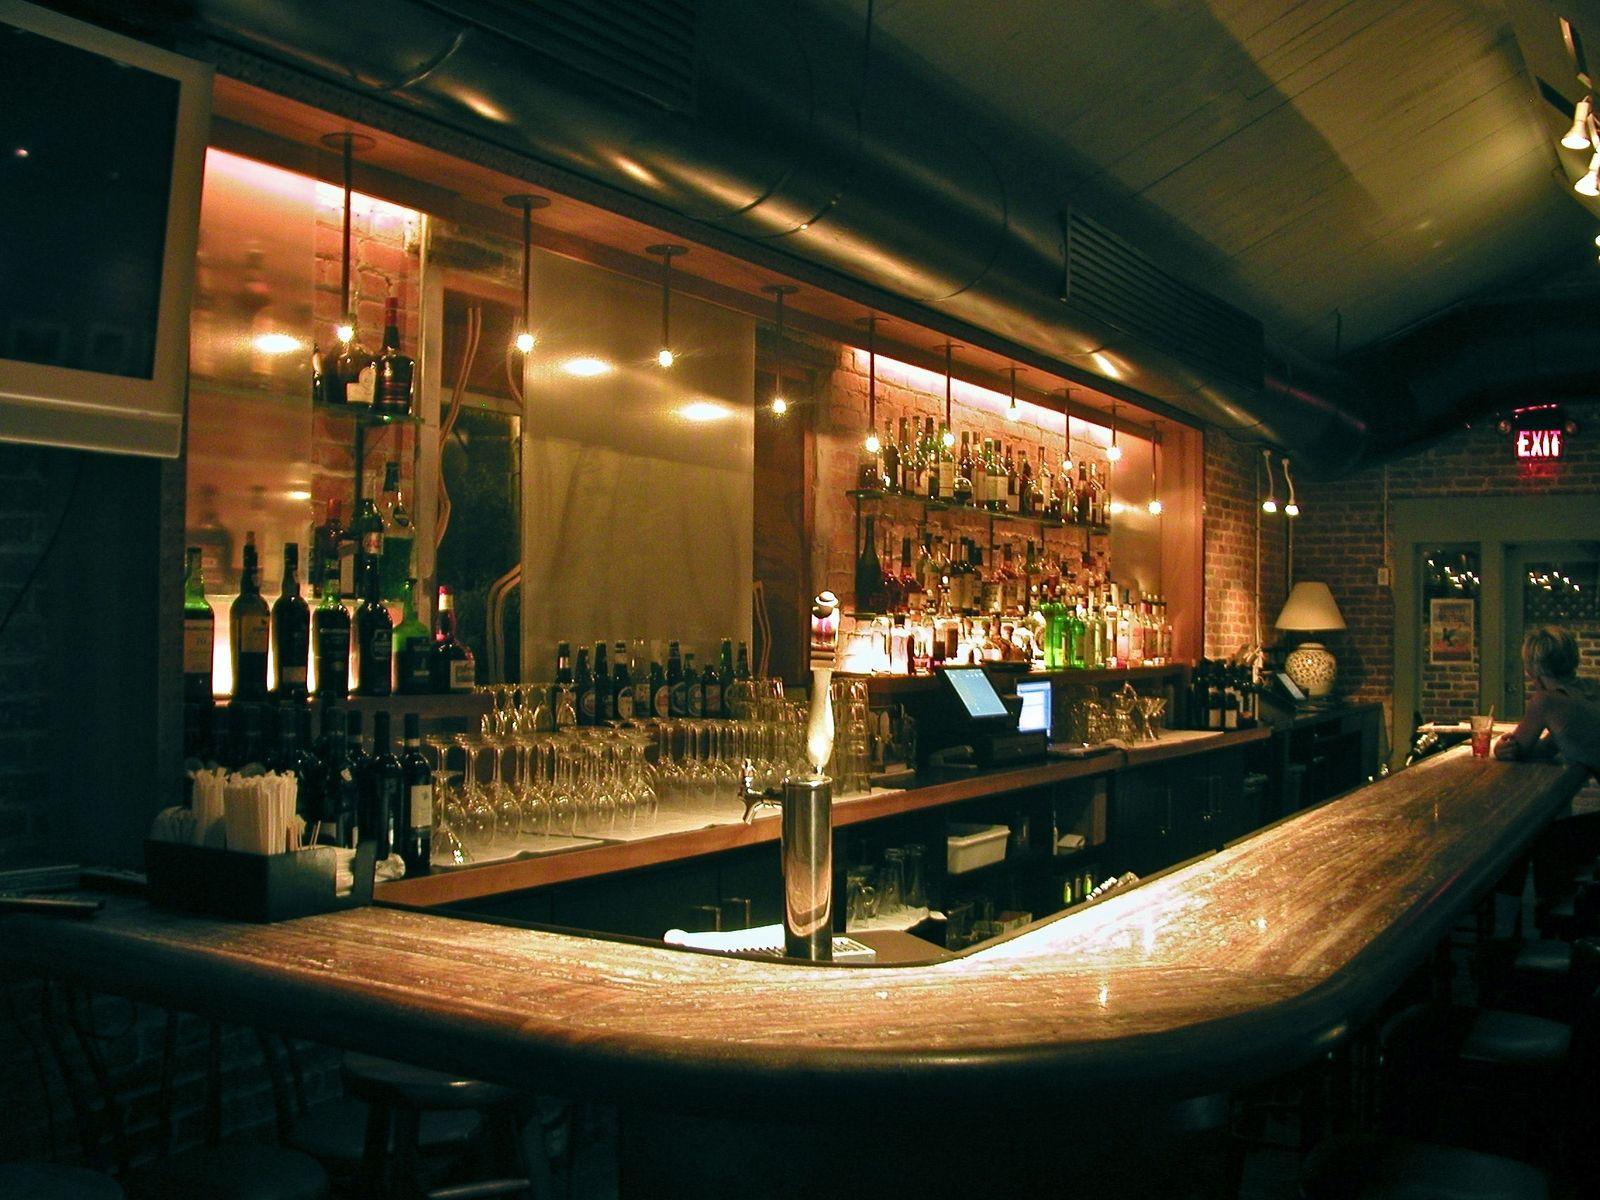 Home Bars And Bar Carts CustomMadecom - Home liquor bar designs